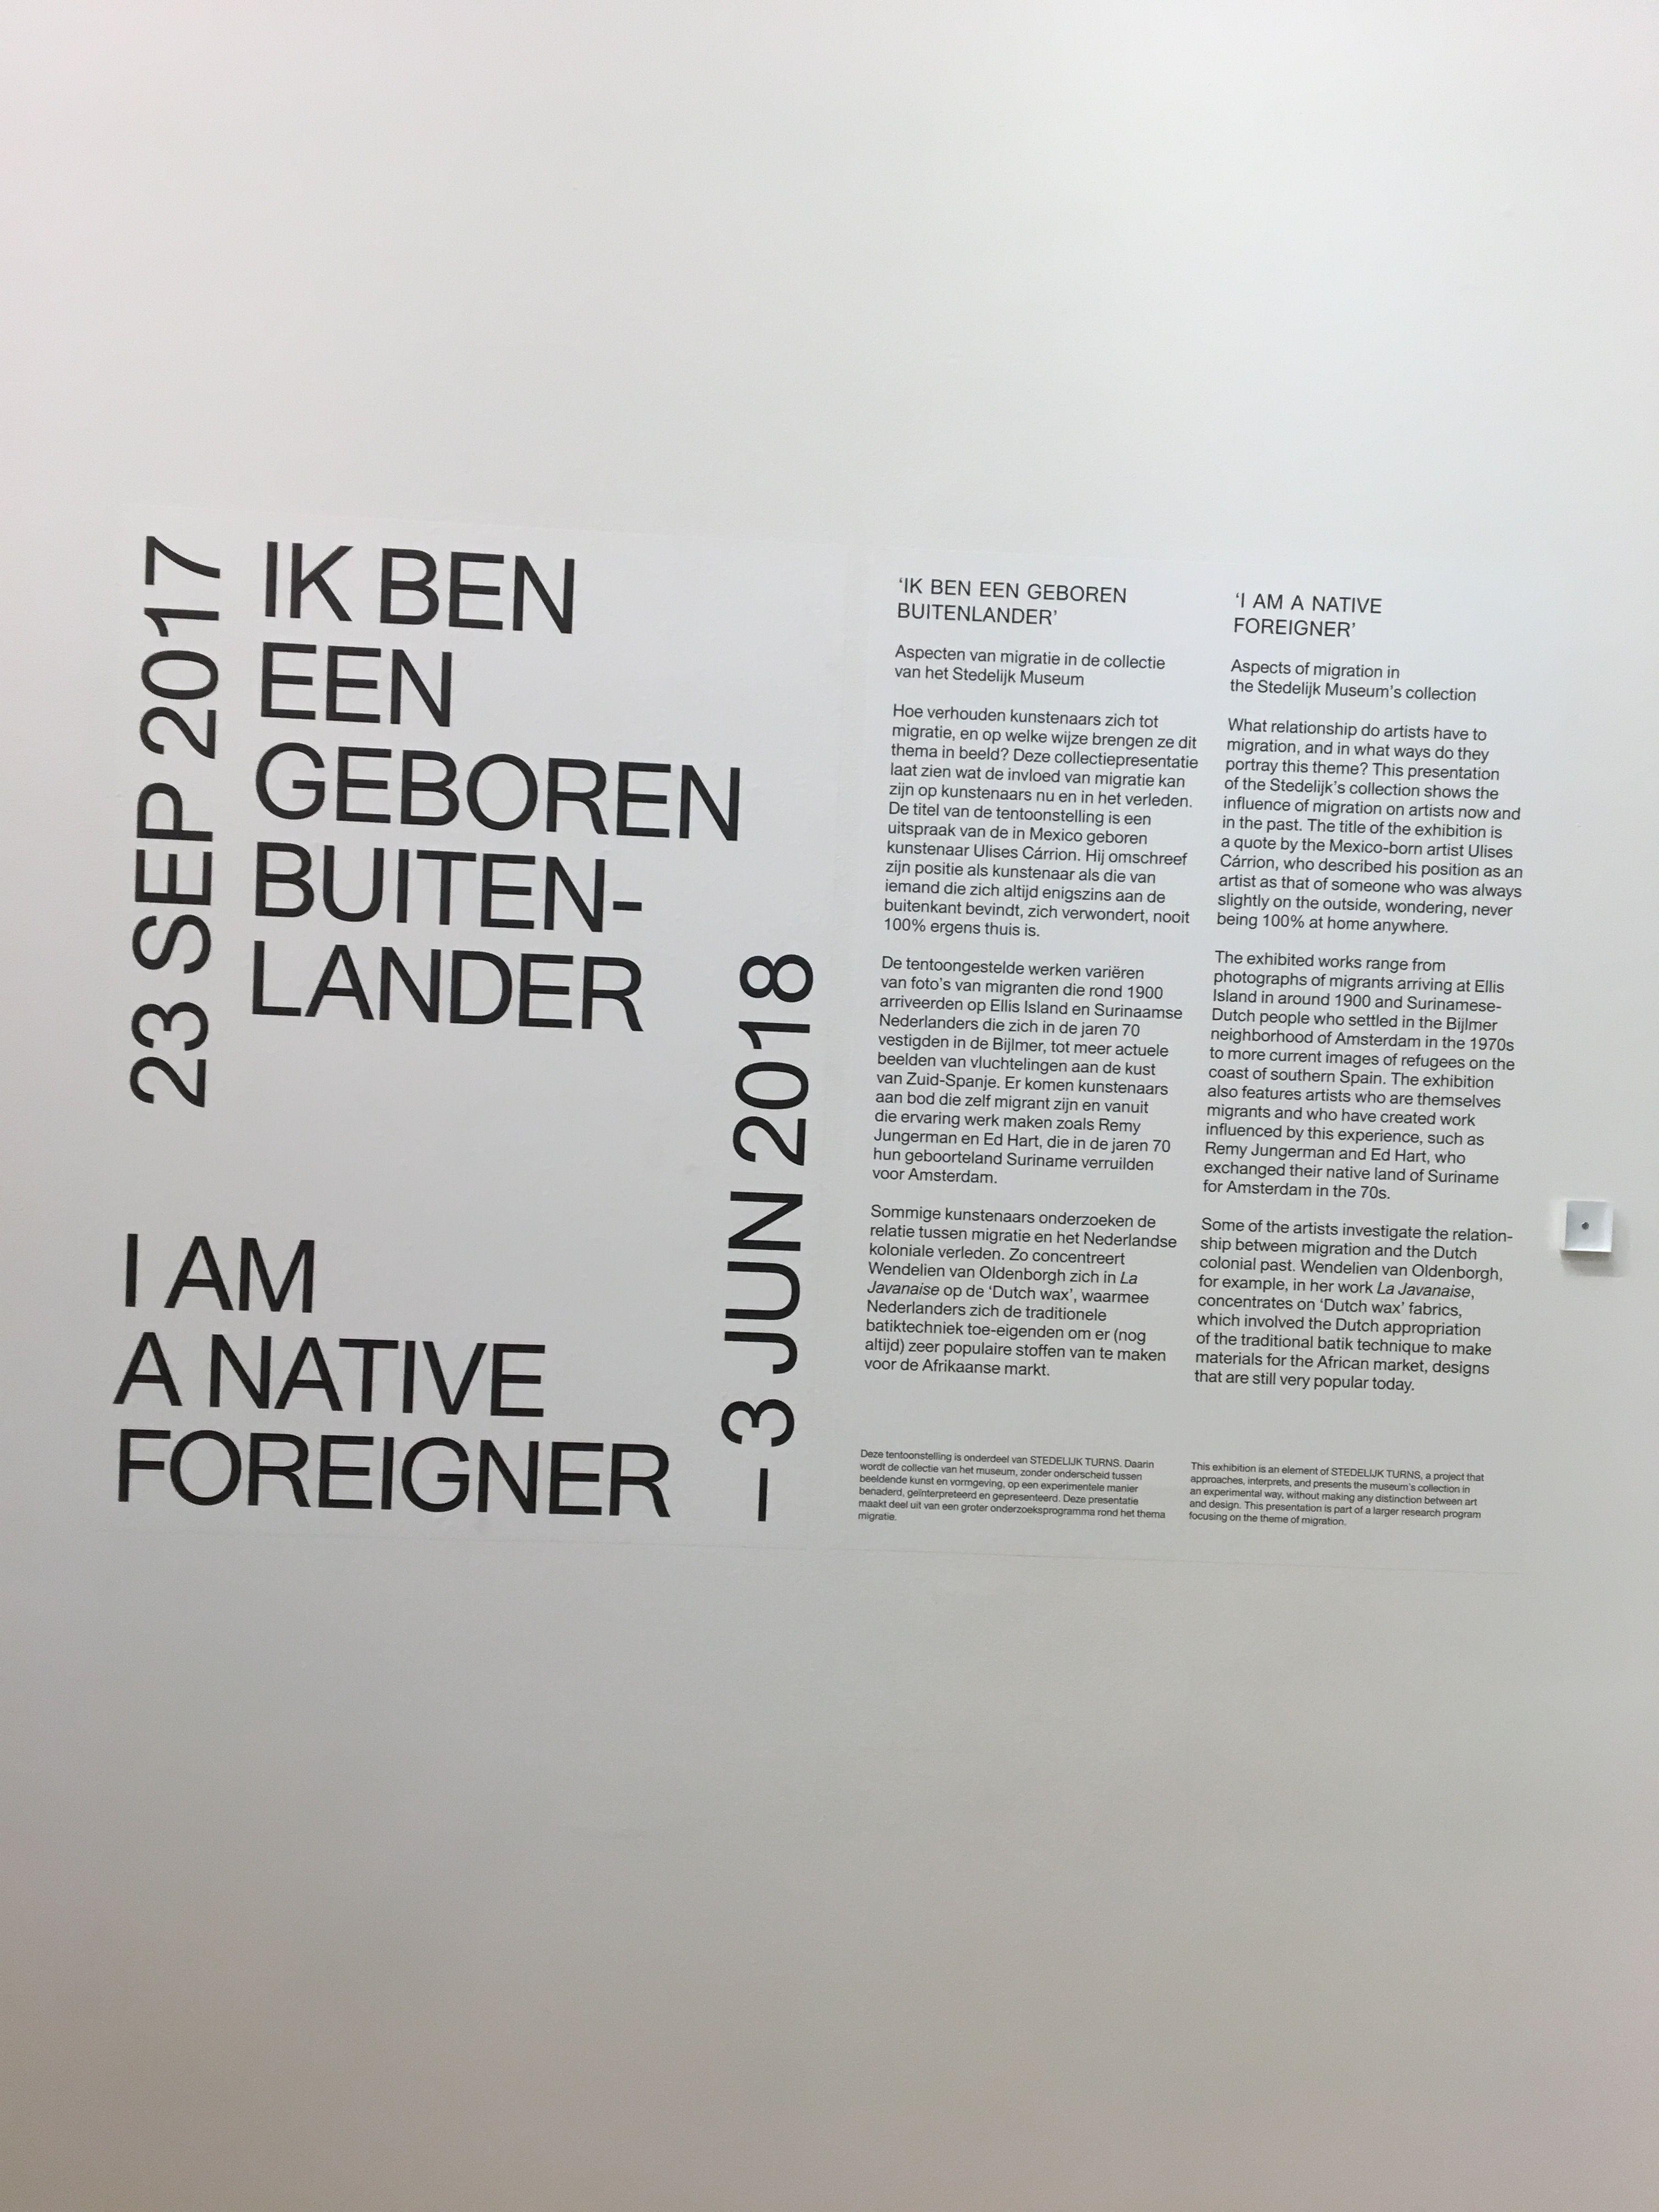 Pin By Luke Dalton On Cultural Landscapes